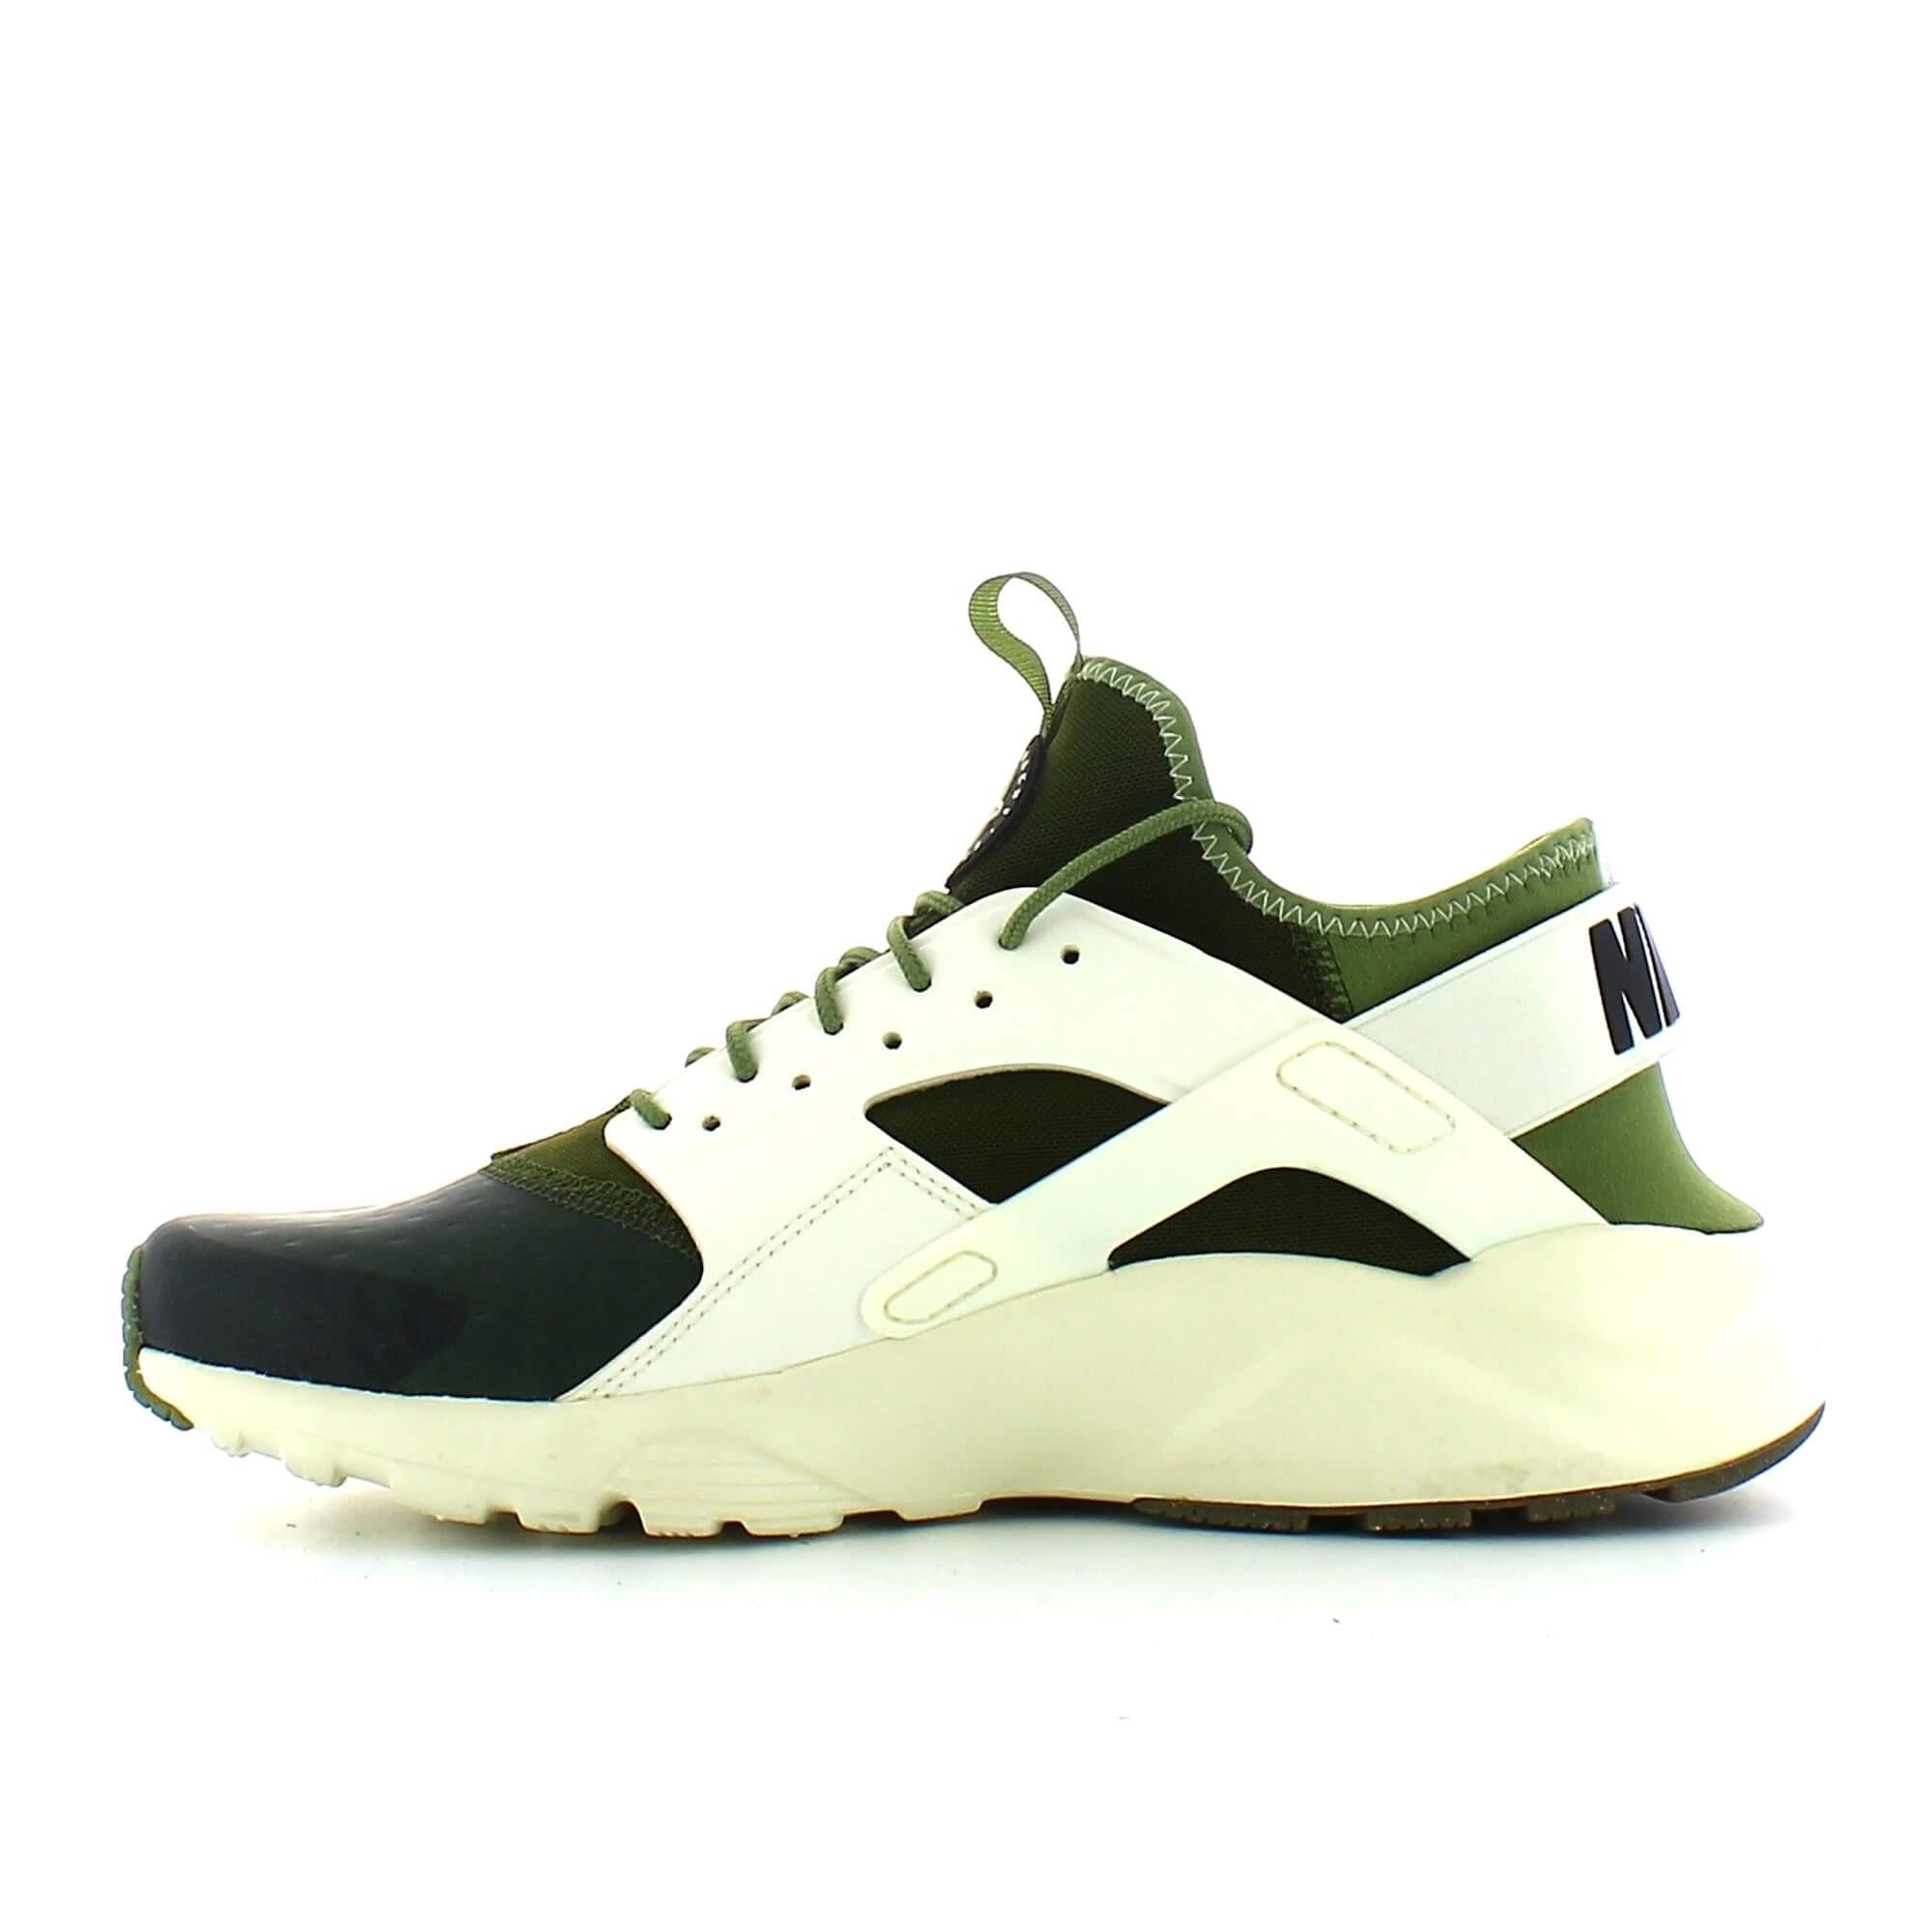 Recuerdo En riesgo Mendigar  nike air huarache run ultra se casual zapatillas new style 180d6 fcf6c